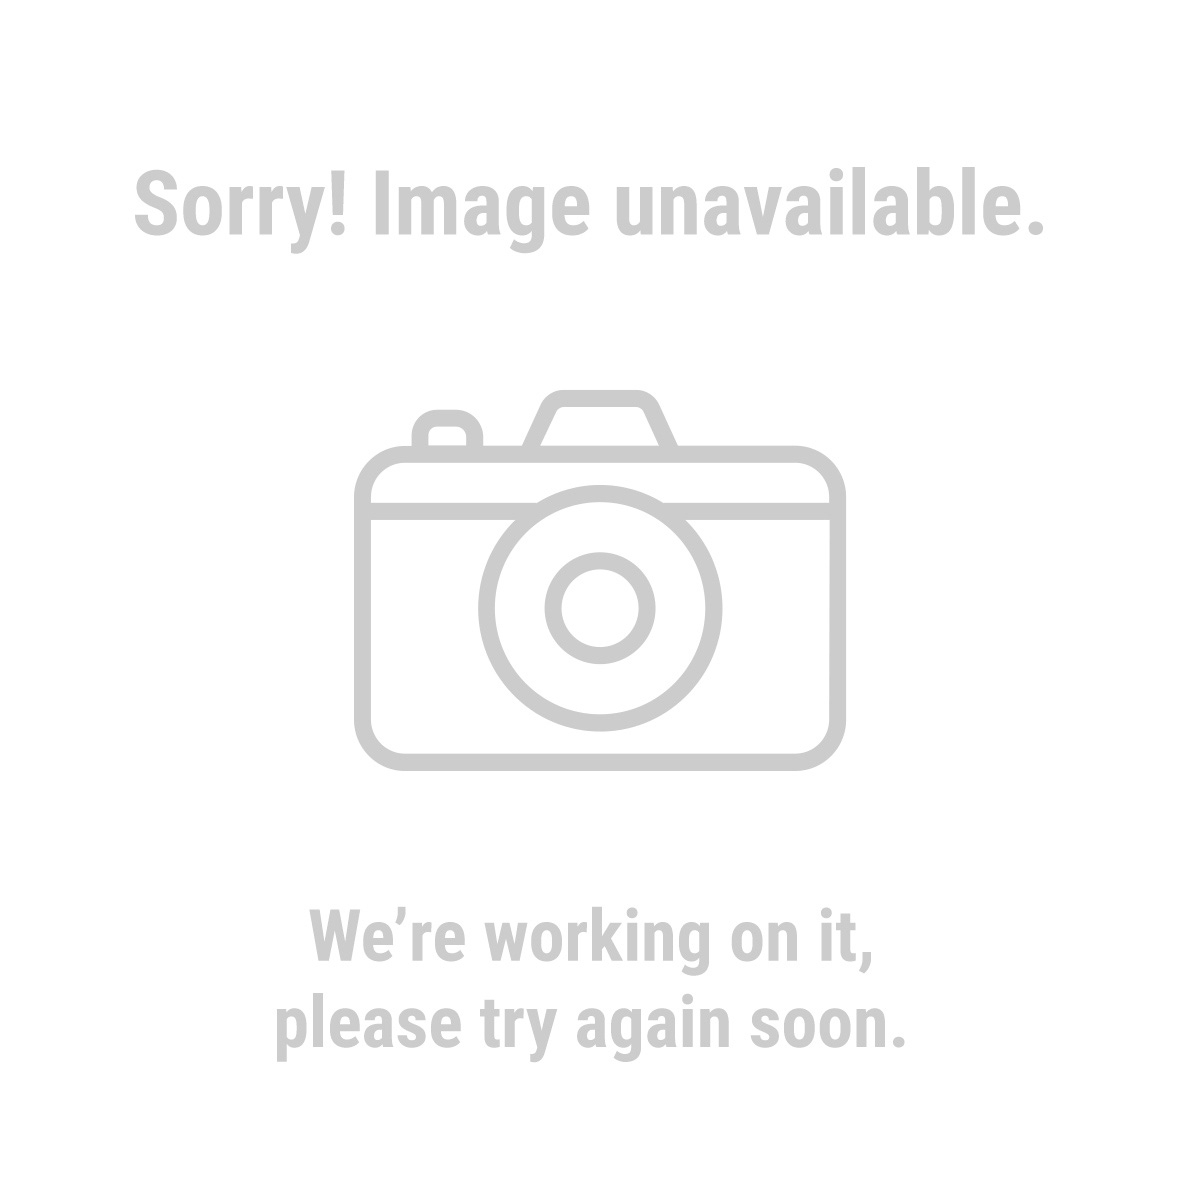 "Haul-Master 69616 72"" x 96"" Full Size Pickup Cargo Net"